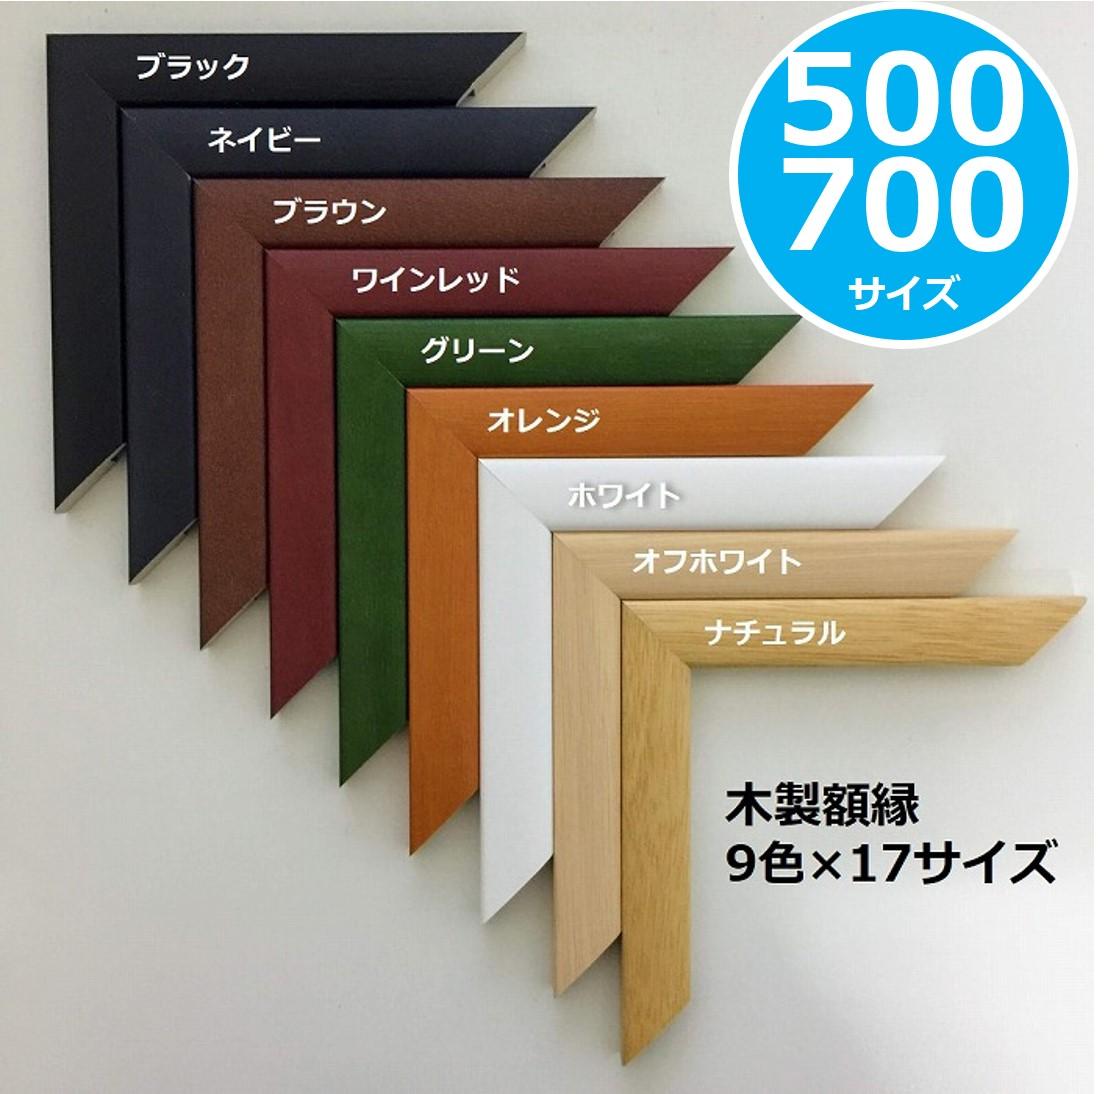 500×700mm 9色から選べる国産木製額縁 取り扱い簡単サイズも豊富シンプルデザインで大好評 最安値 パネル ポスターフレーム 国産木製額縁 人気の製品